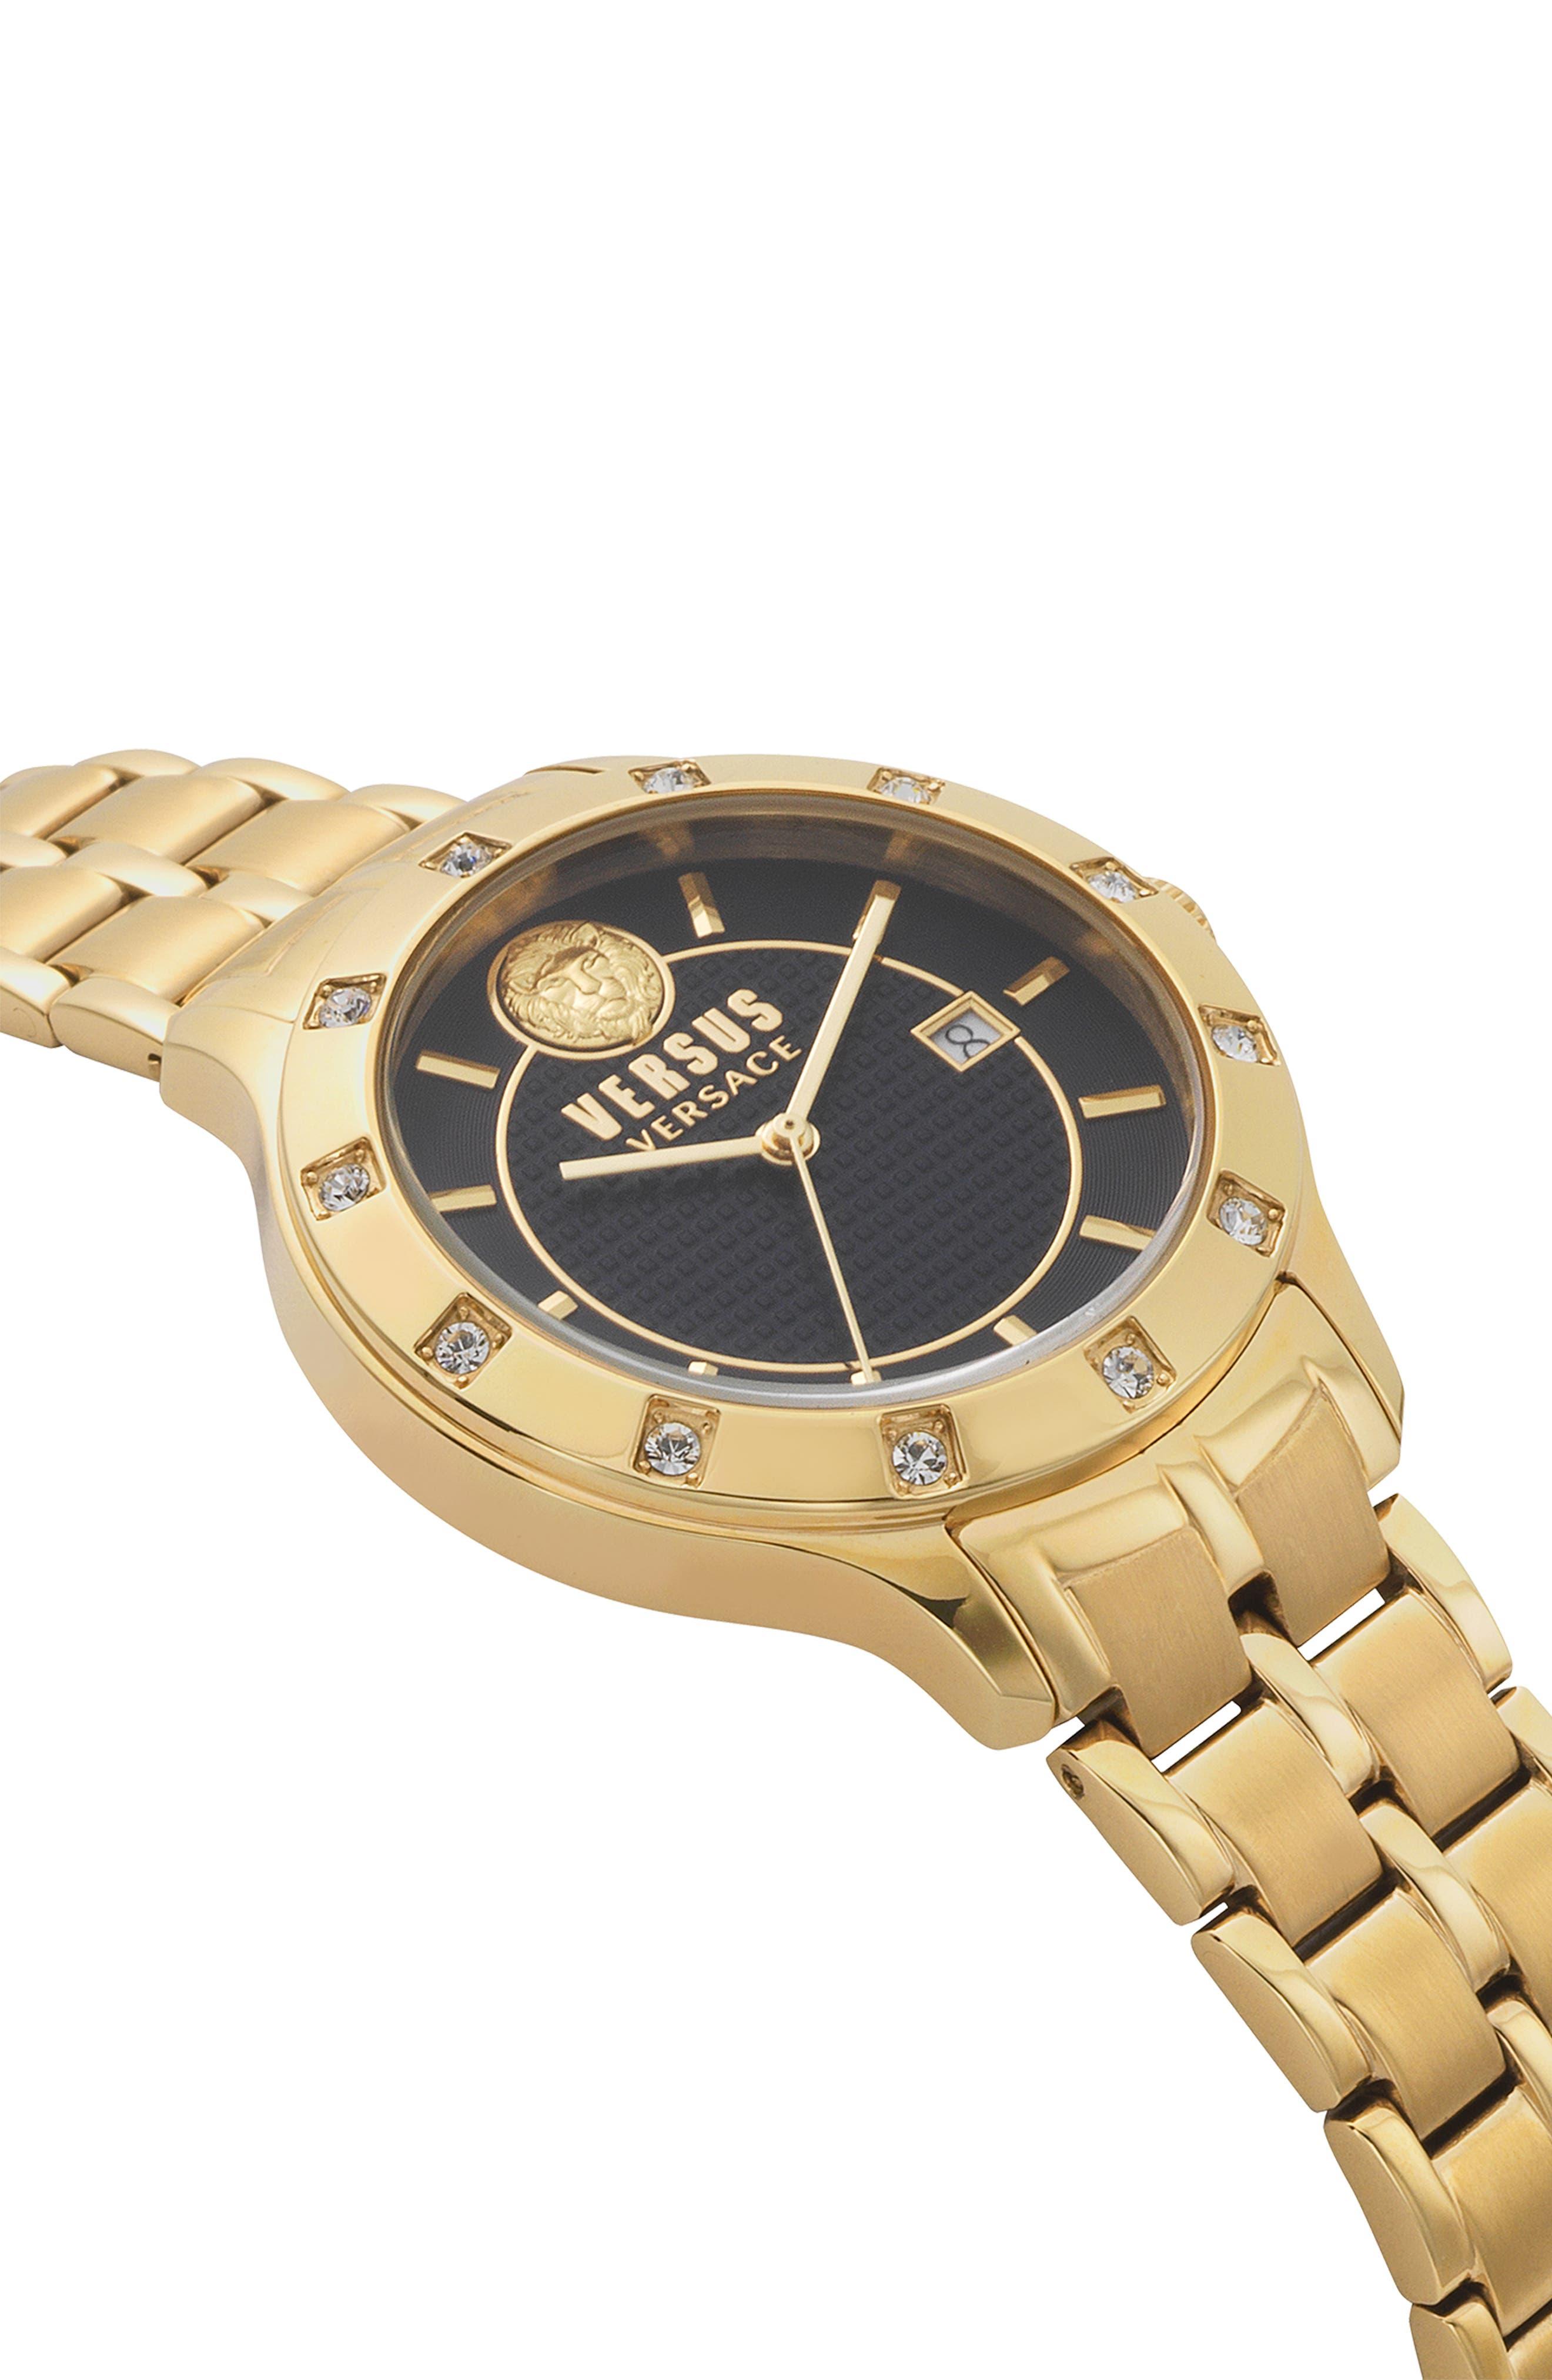 VERSUS VERSACE, Brackenfell Swarovski Bracelet Watch, 38mm, Alternate thumbnail 3, color, GOLD/ BLUE